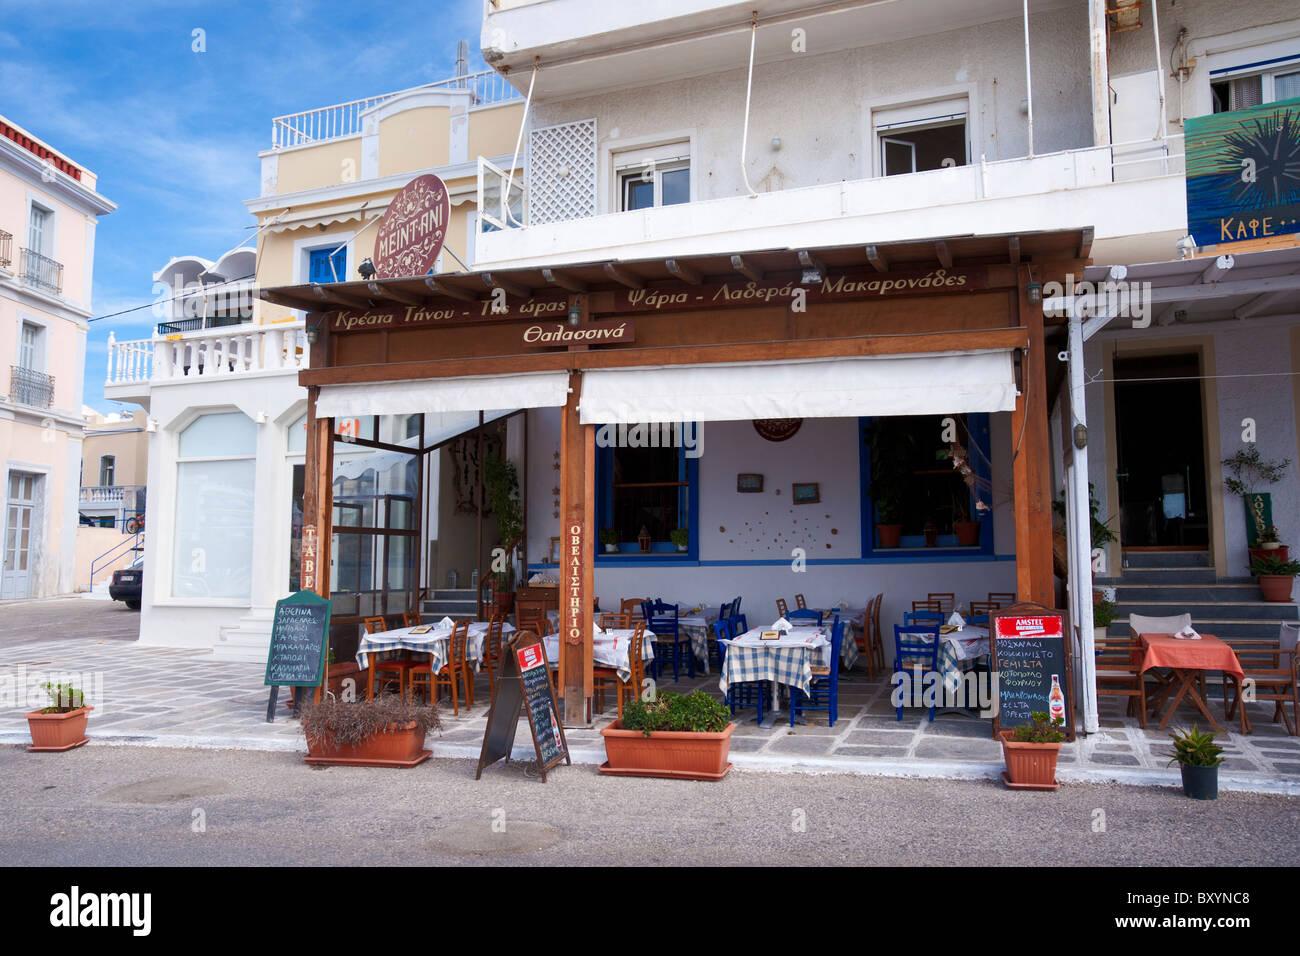 Menu Greek Taverna High Resolution Stock Photography And Images Alamy